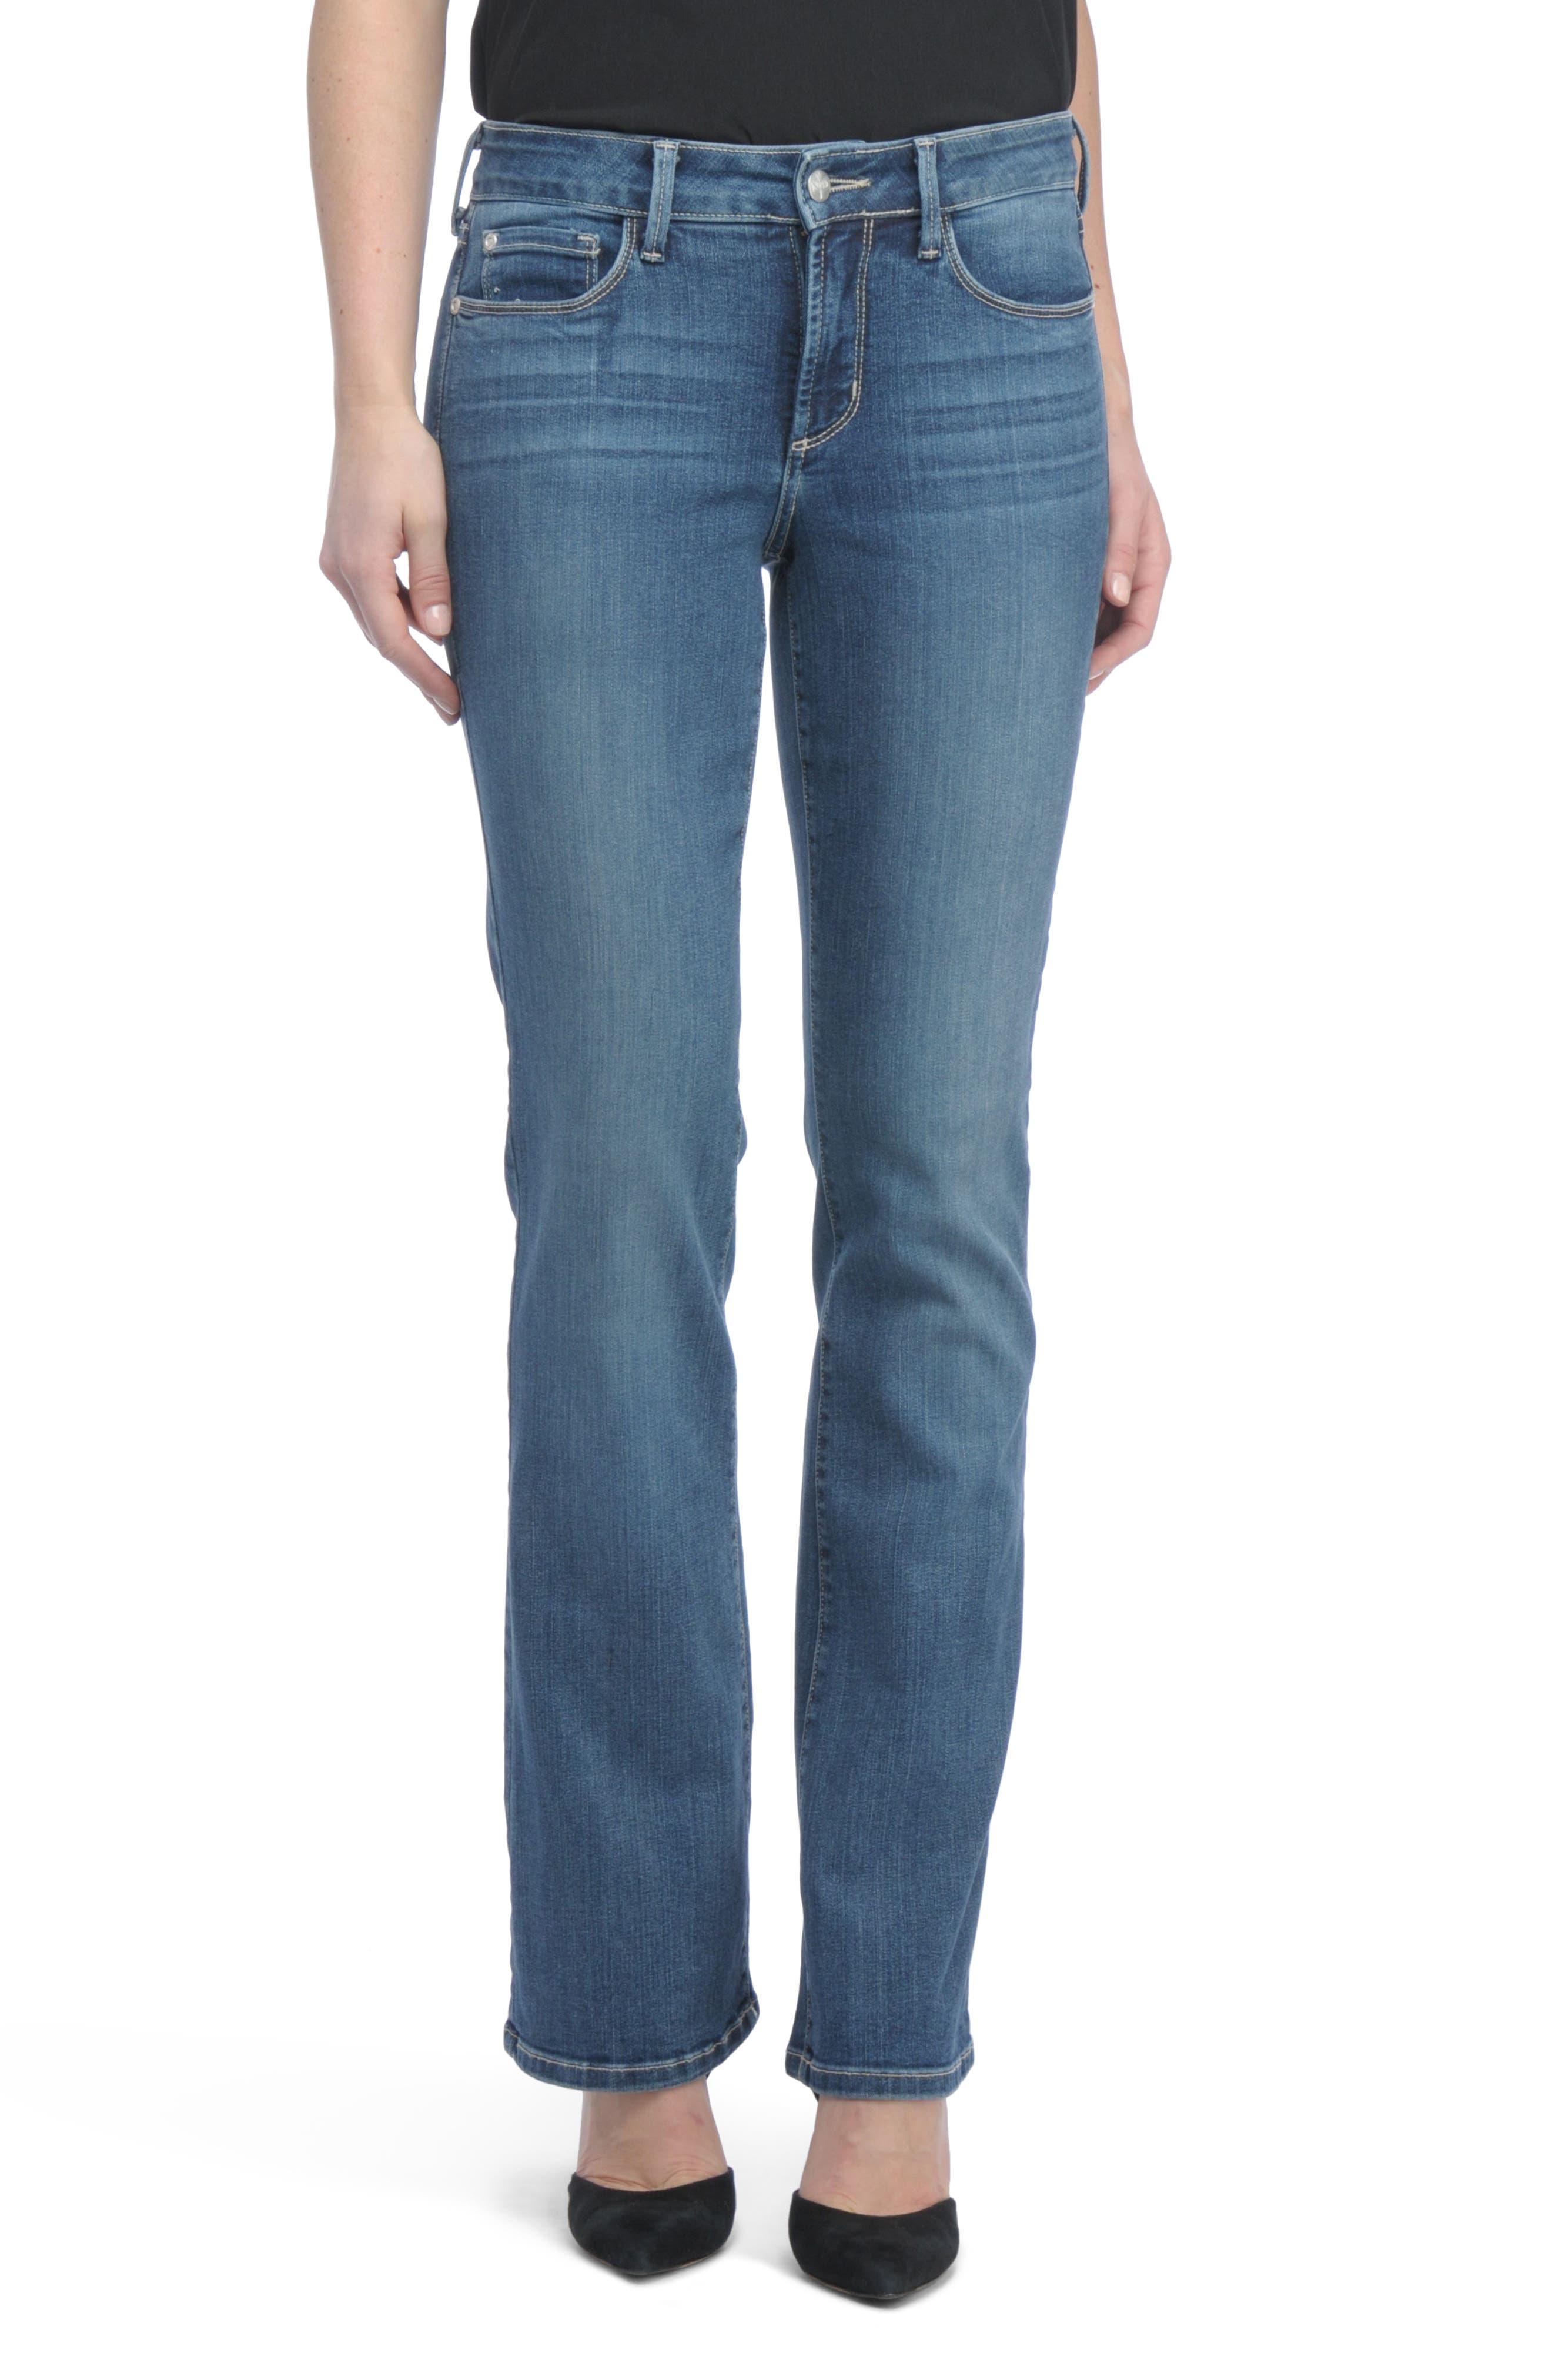 Barbara Bootcut Short Jeans,                         Main,                         color,